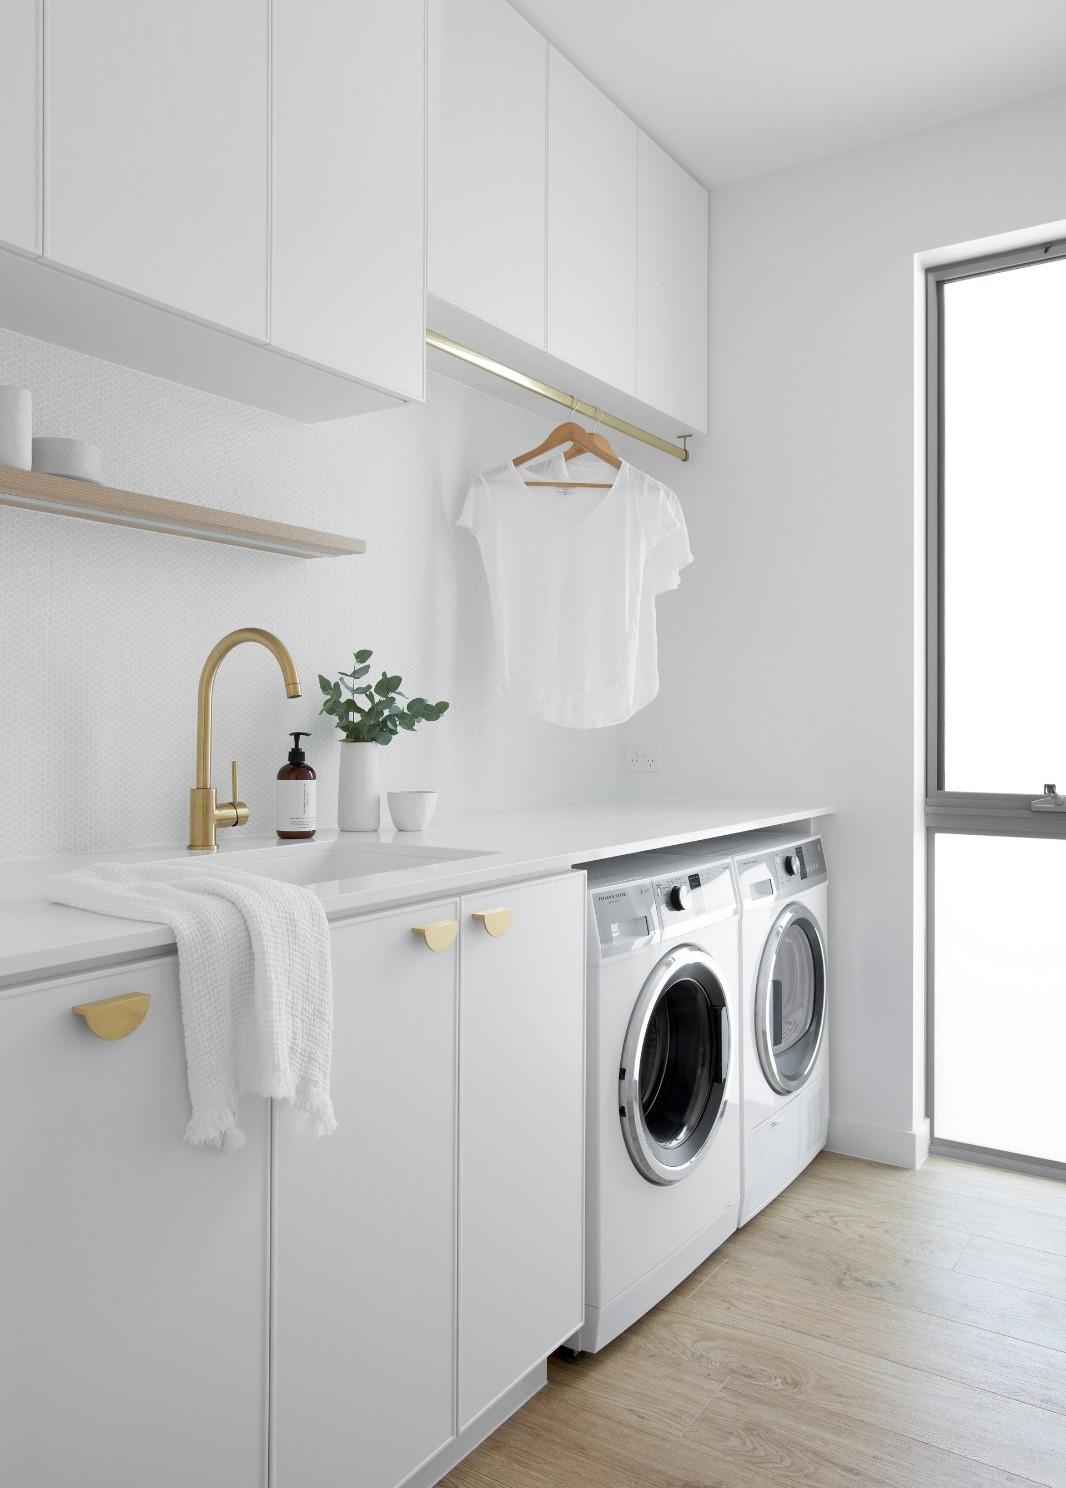 custon laundry cabinet maker